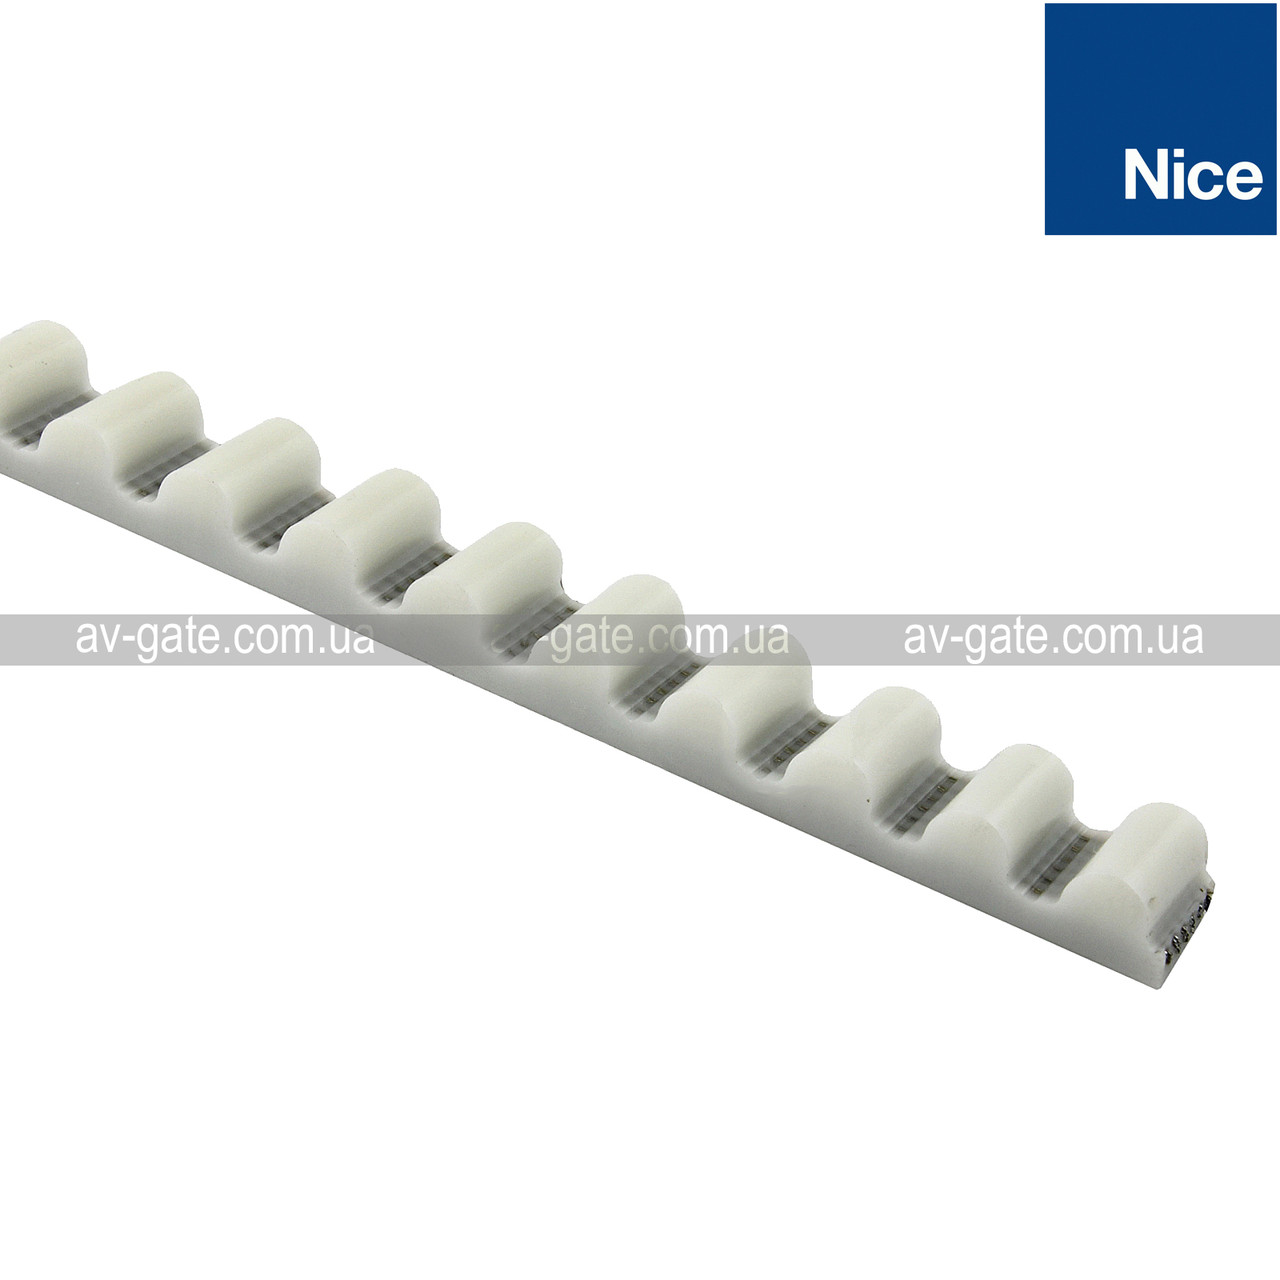 Зубчатый ремень Nice PMCCD1.4630